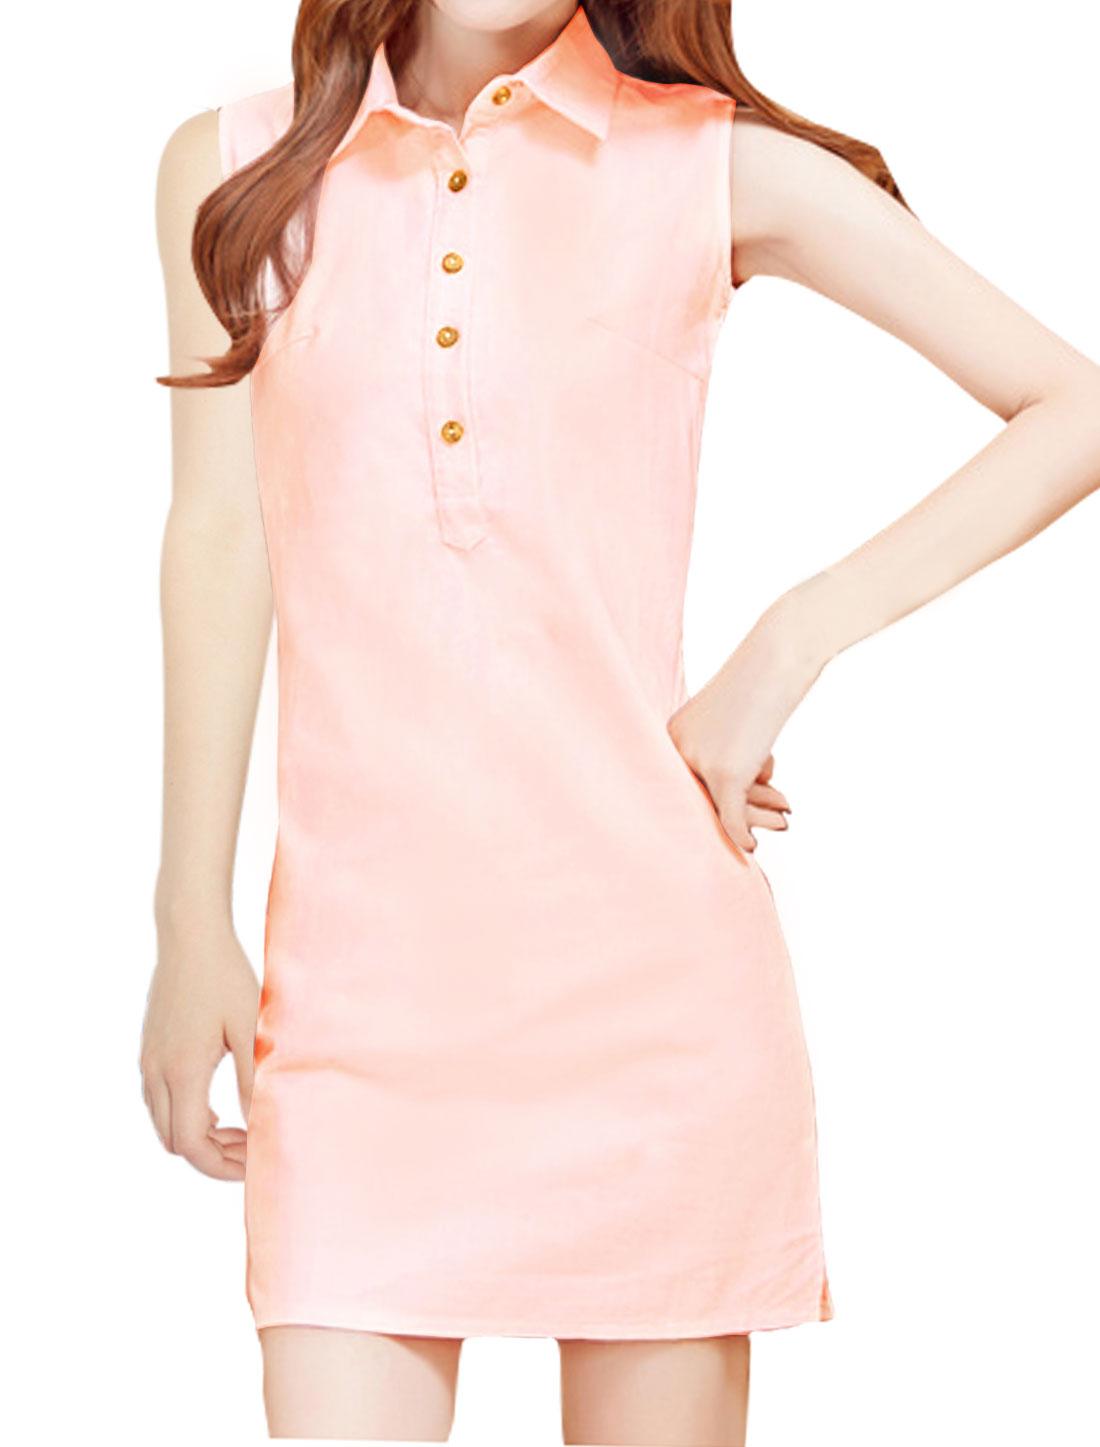 Woman Sleeveless Button Closed Upper Slim Fit Shirt Dress Pink S